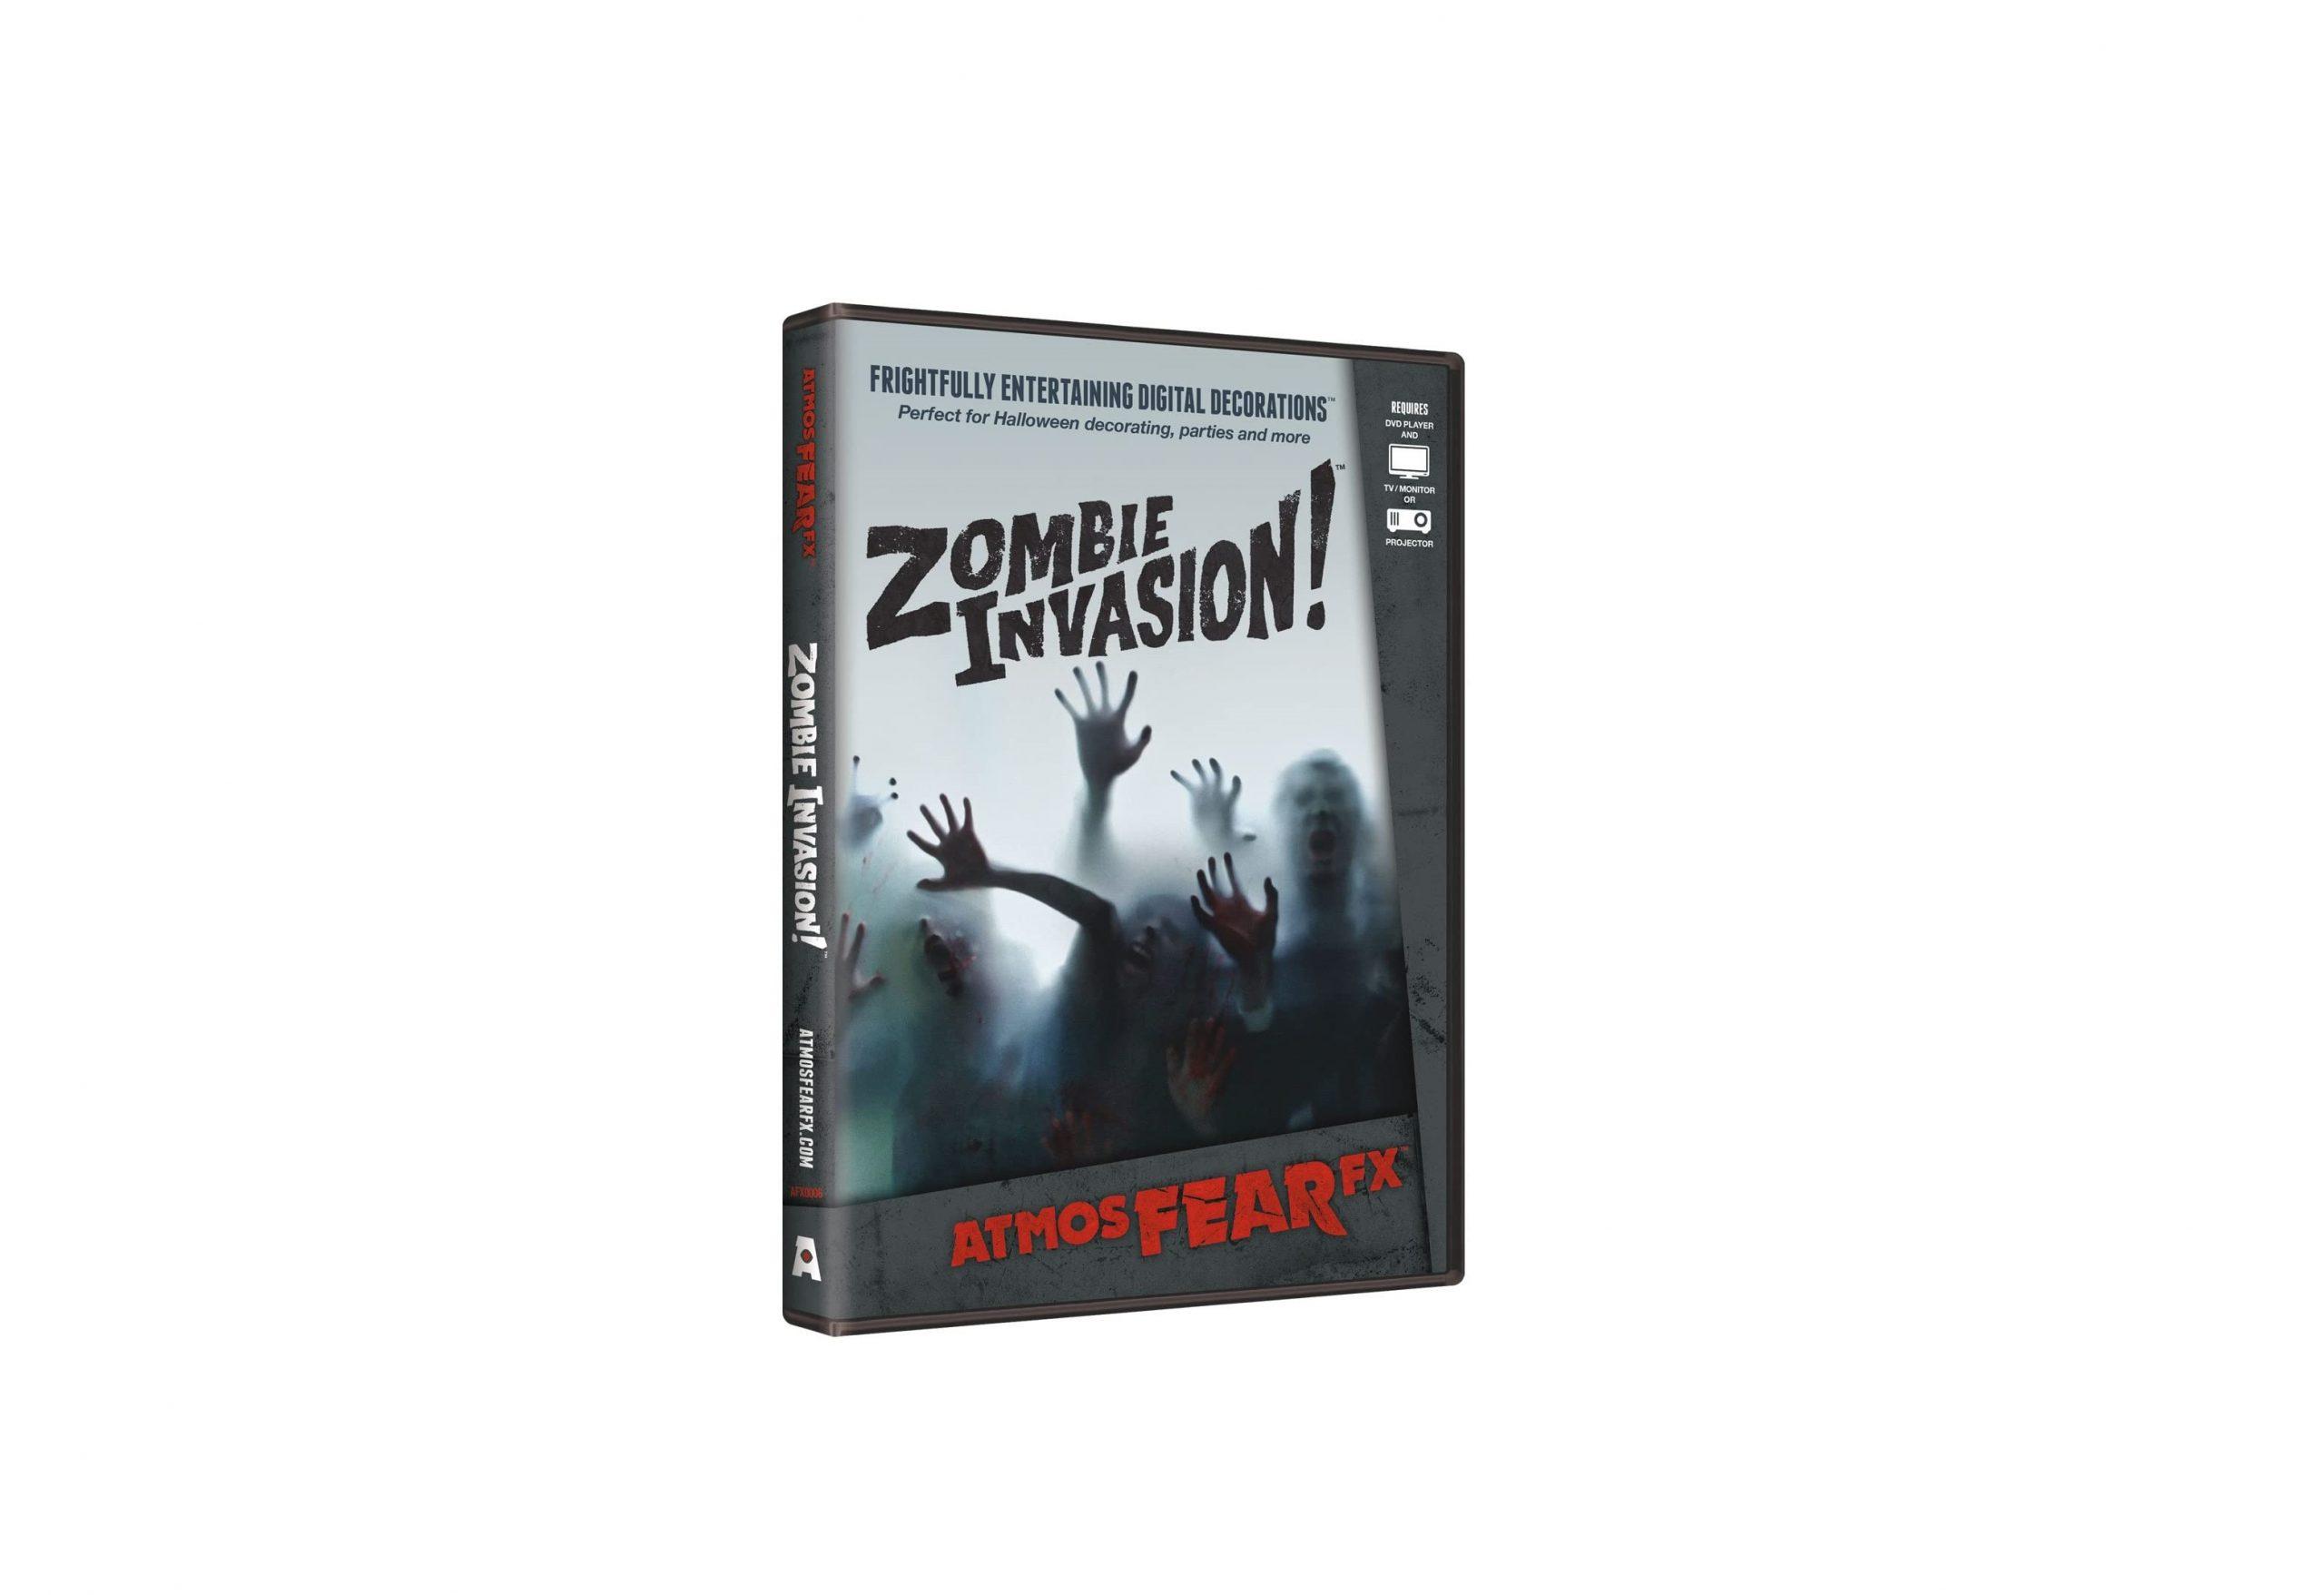 AtmosFEARfx - Zombie Invasion